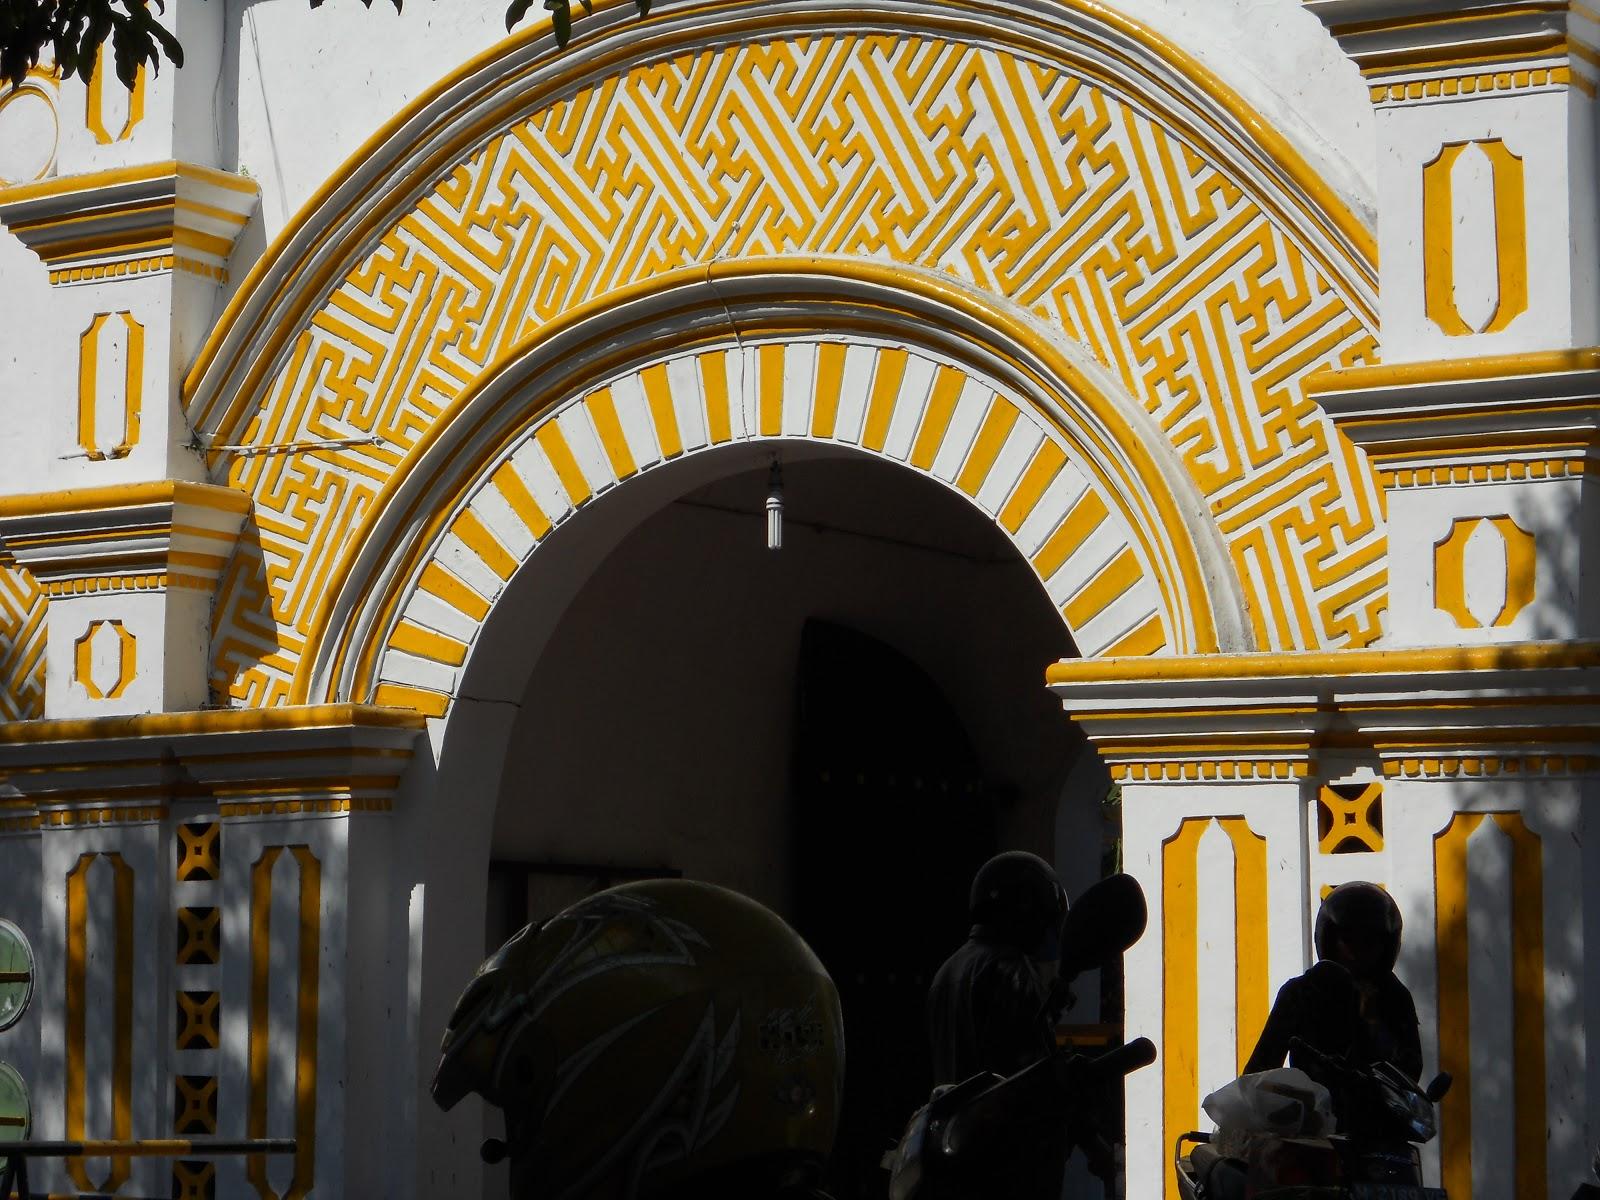 Bapontar Indonesia Lauw Piango Arsitek Mesjid Agung Sumenep Ukiran Gerbang